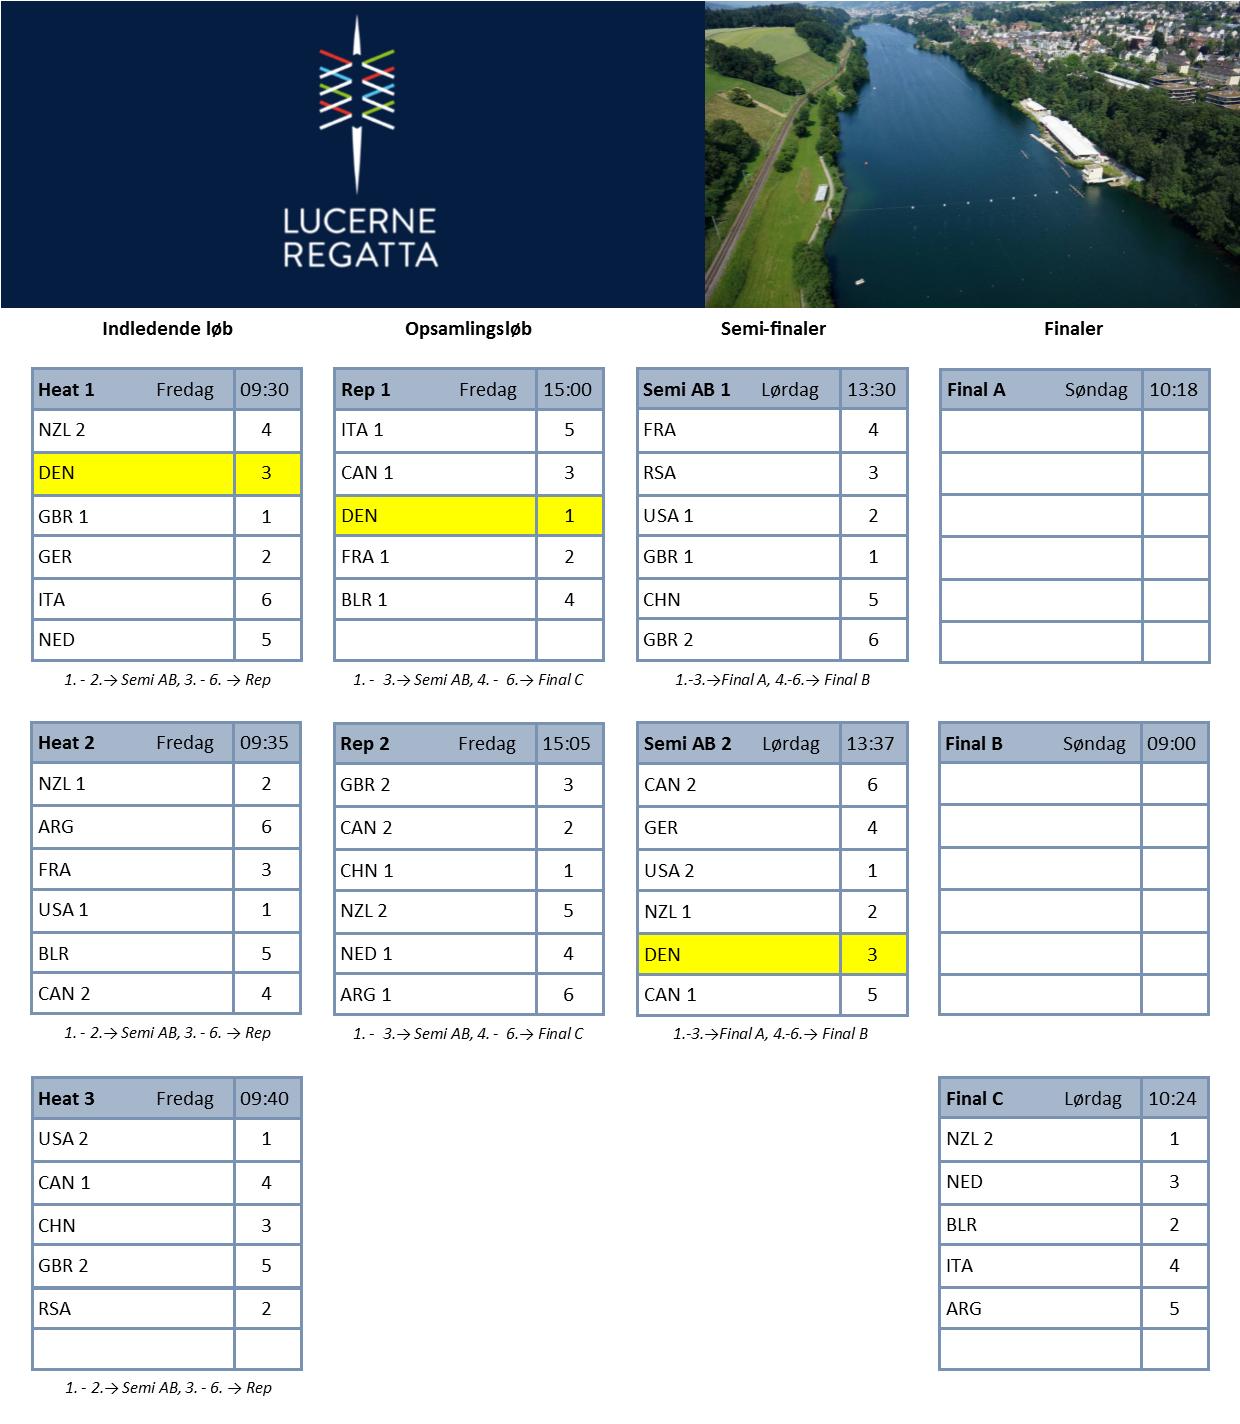 Heat progression chart - Semifinaler